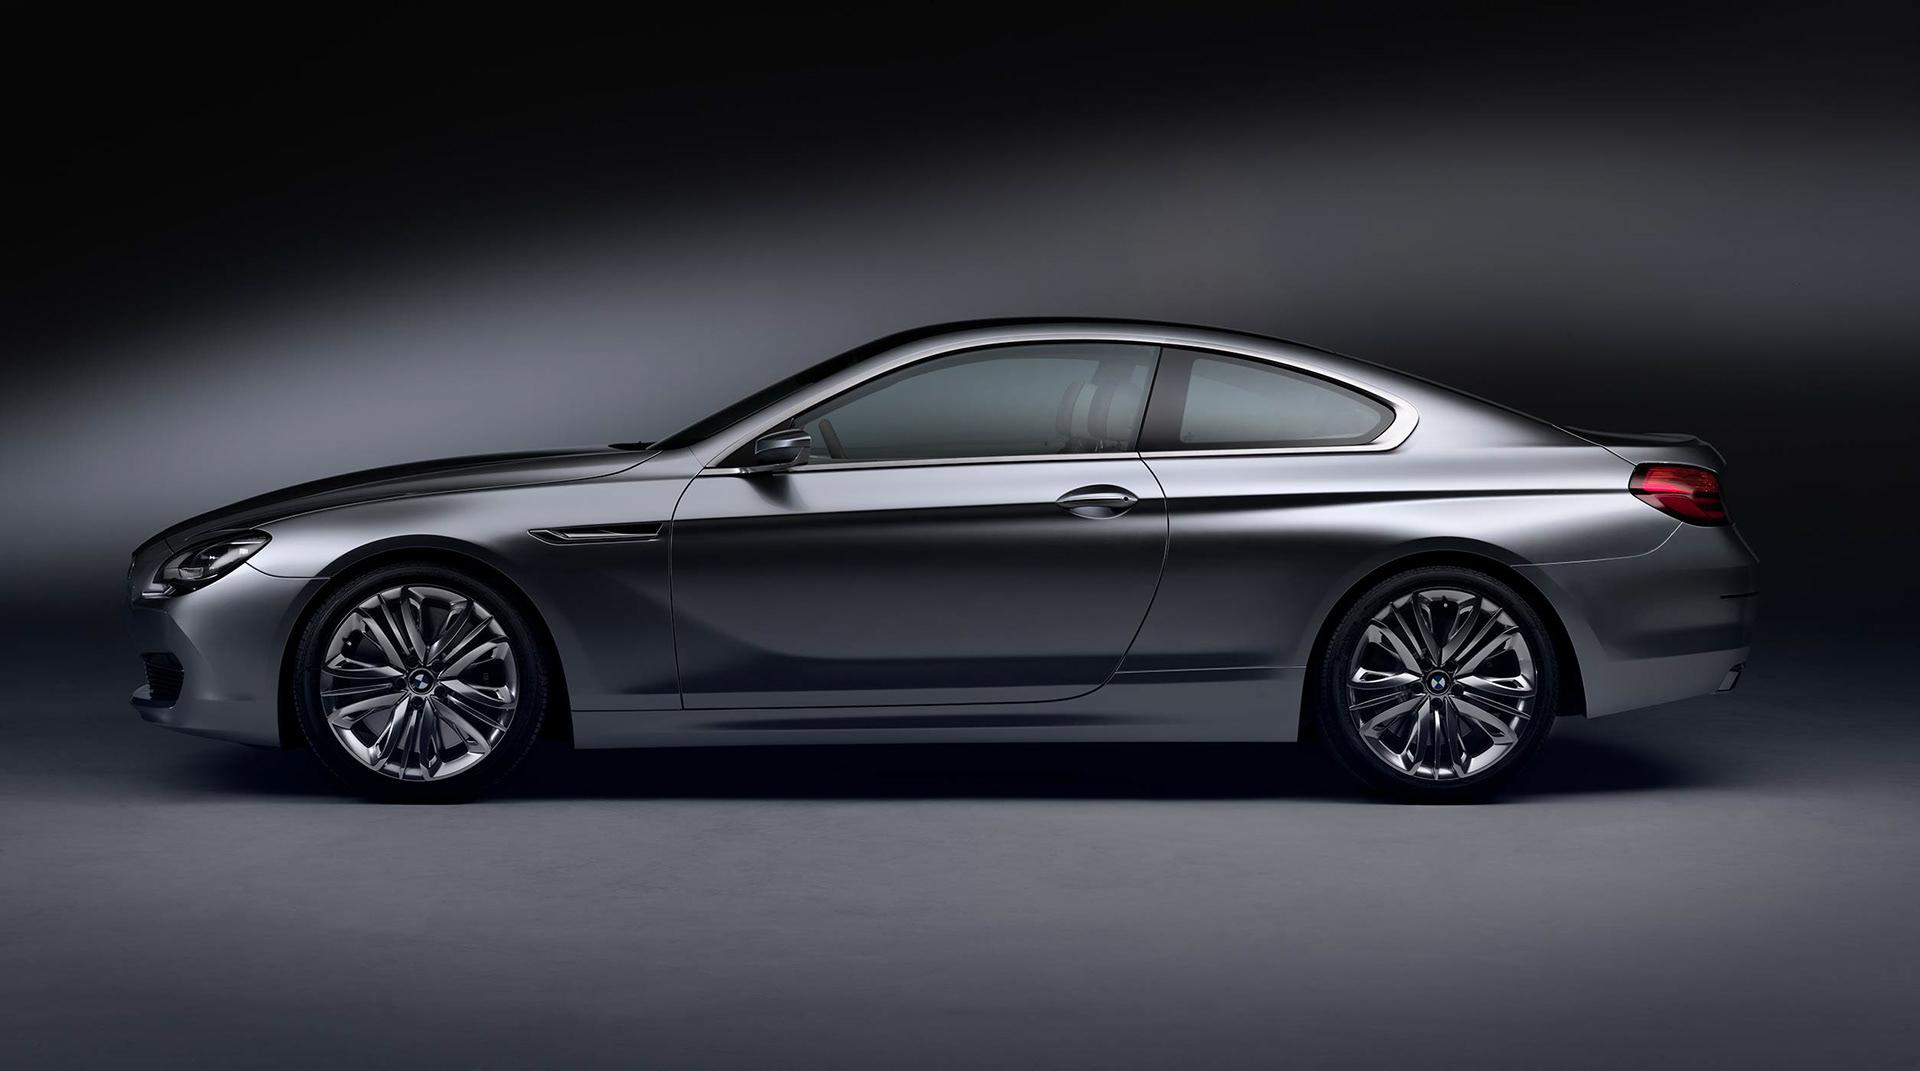 2017 Bmw 6 Series >> Sebastian Mann - BMW series 6 concept